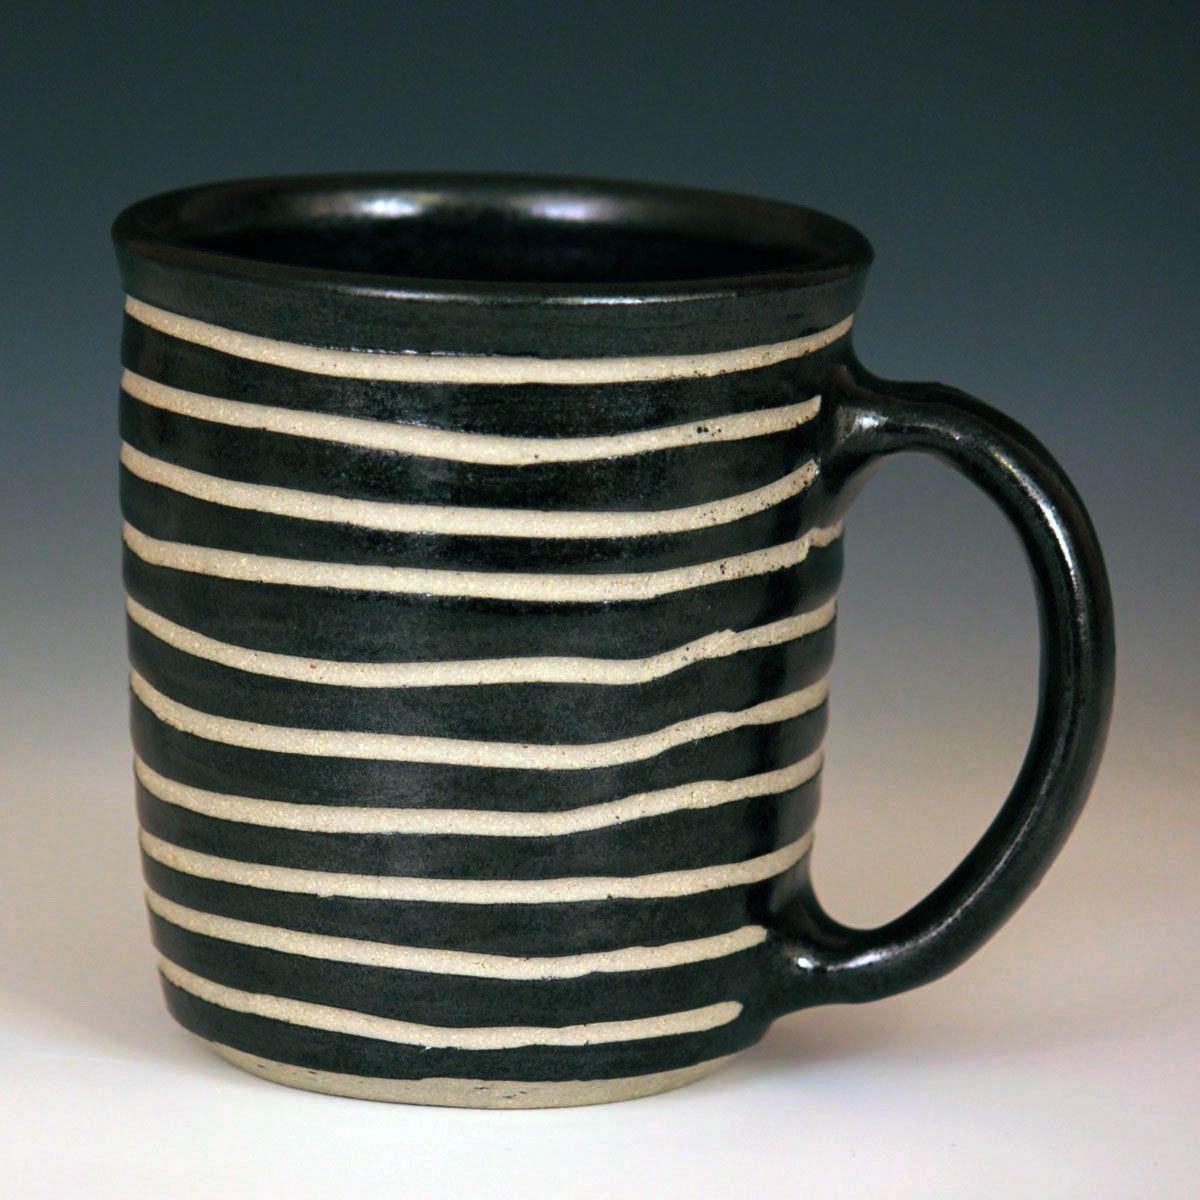 Wheel Thrown Mugs by Larry Halvorsen (Ceramic Mug)   Artful Home